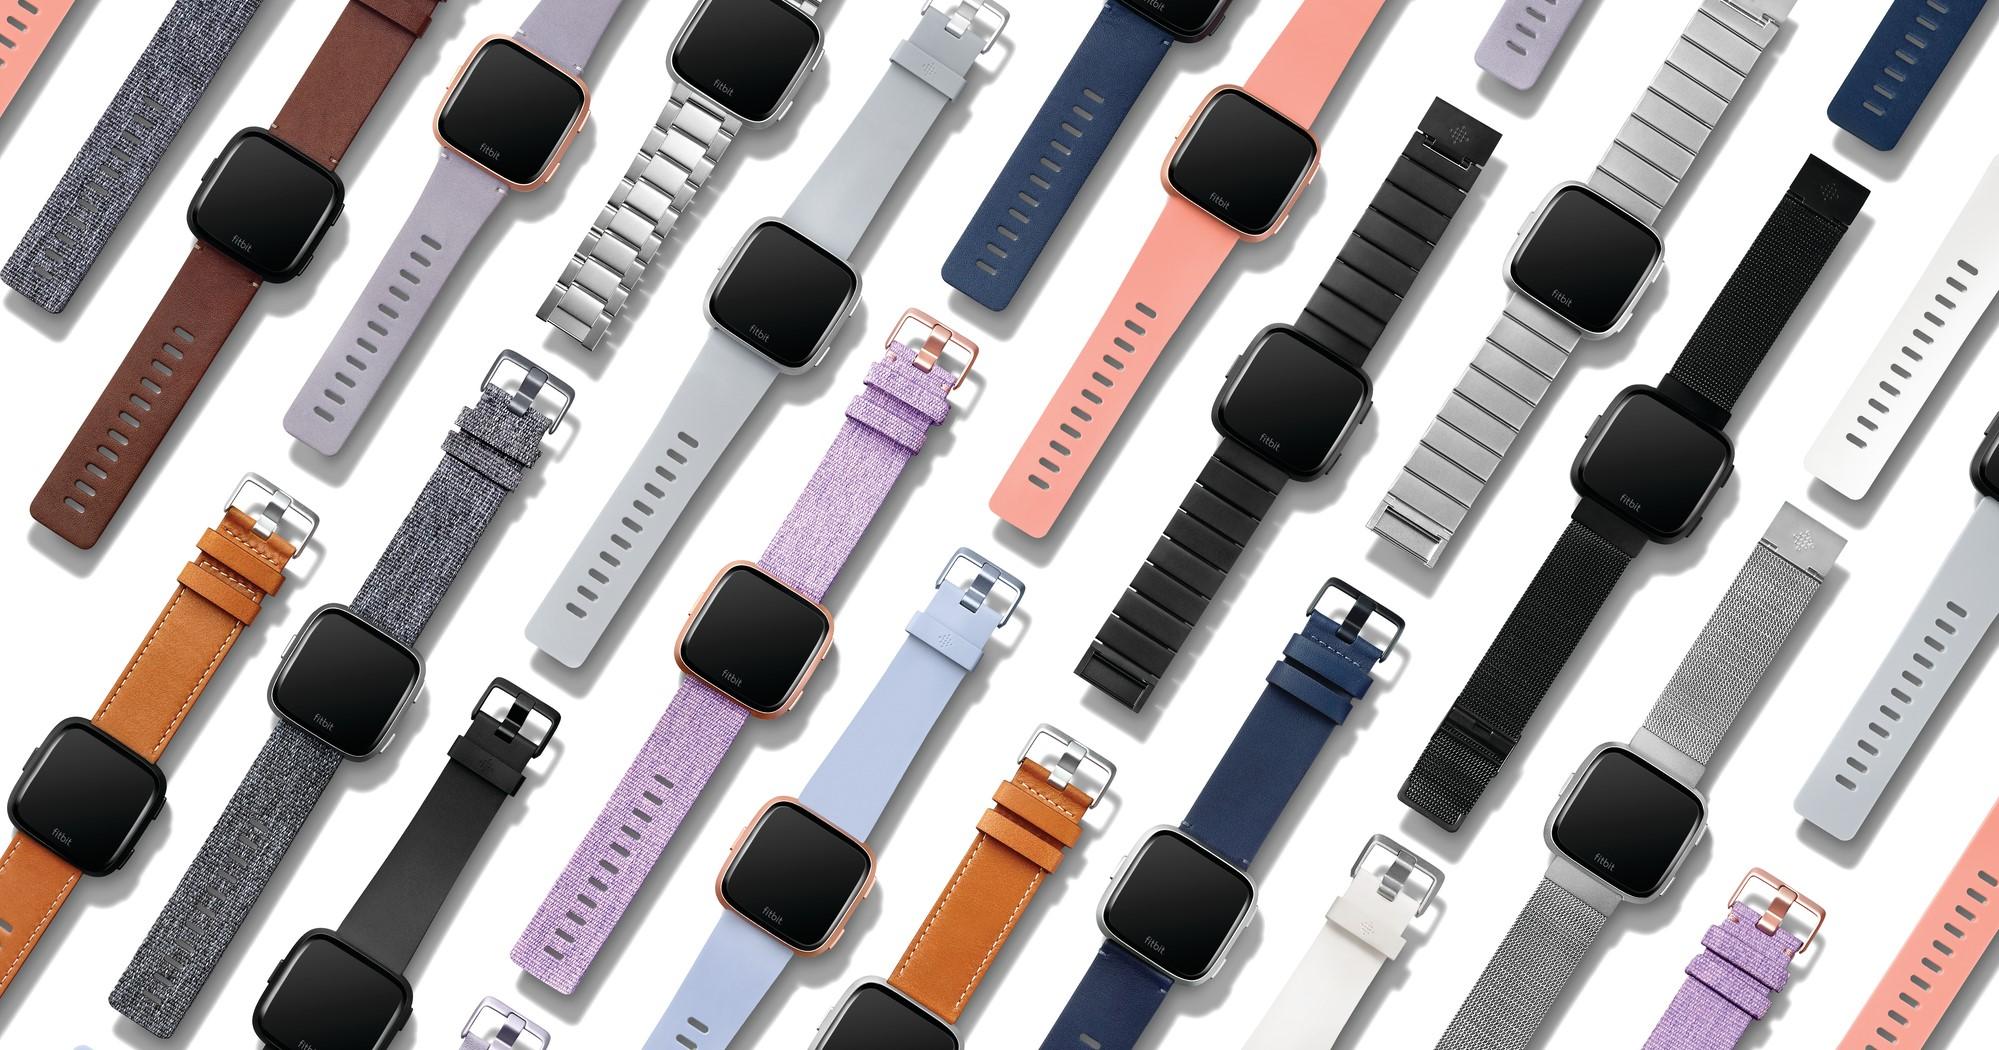 Will Regulators Derail Google's $2.1 Billion Takeover of Fitbit? - RapidAPI